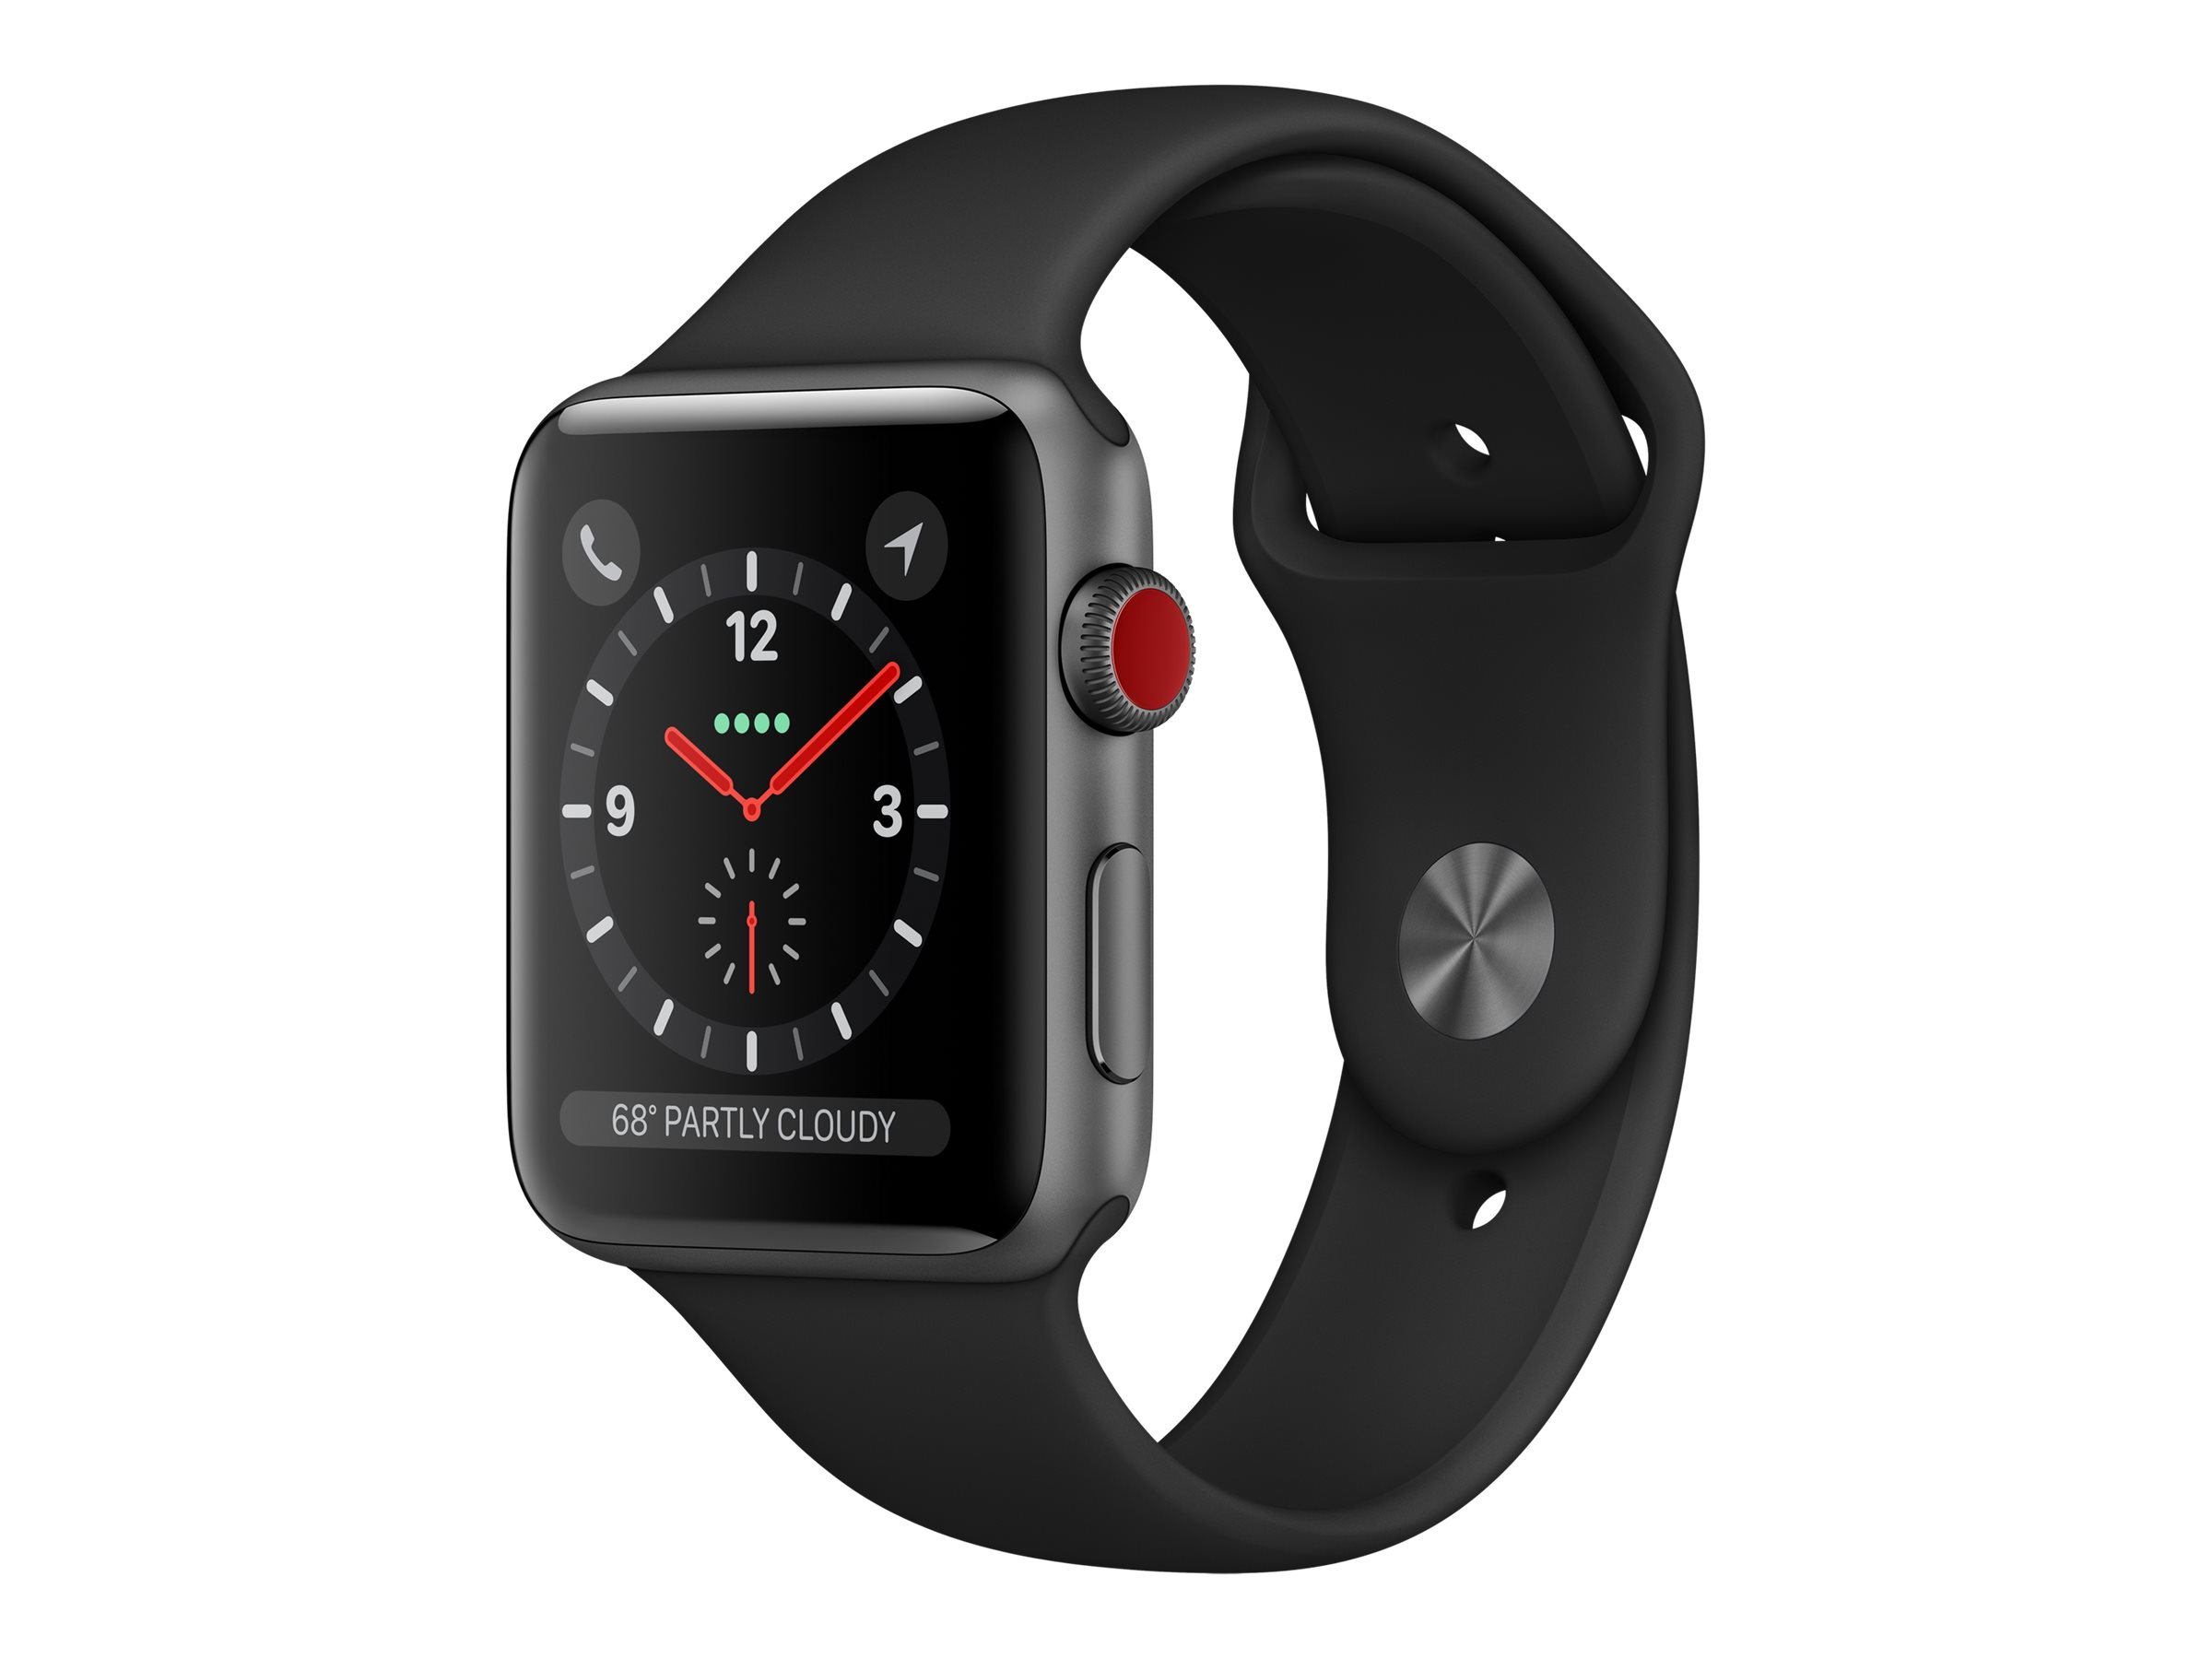 Apple Watch Series 3 (GPS + Cellular) - 42 mm